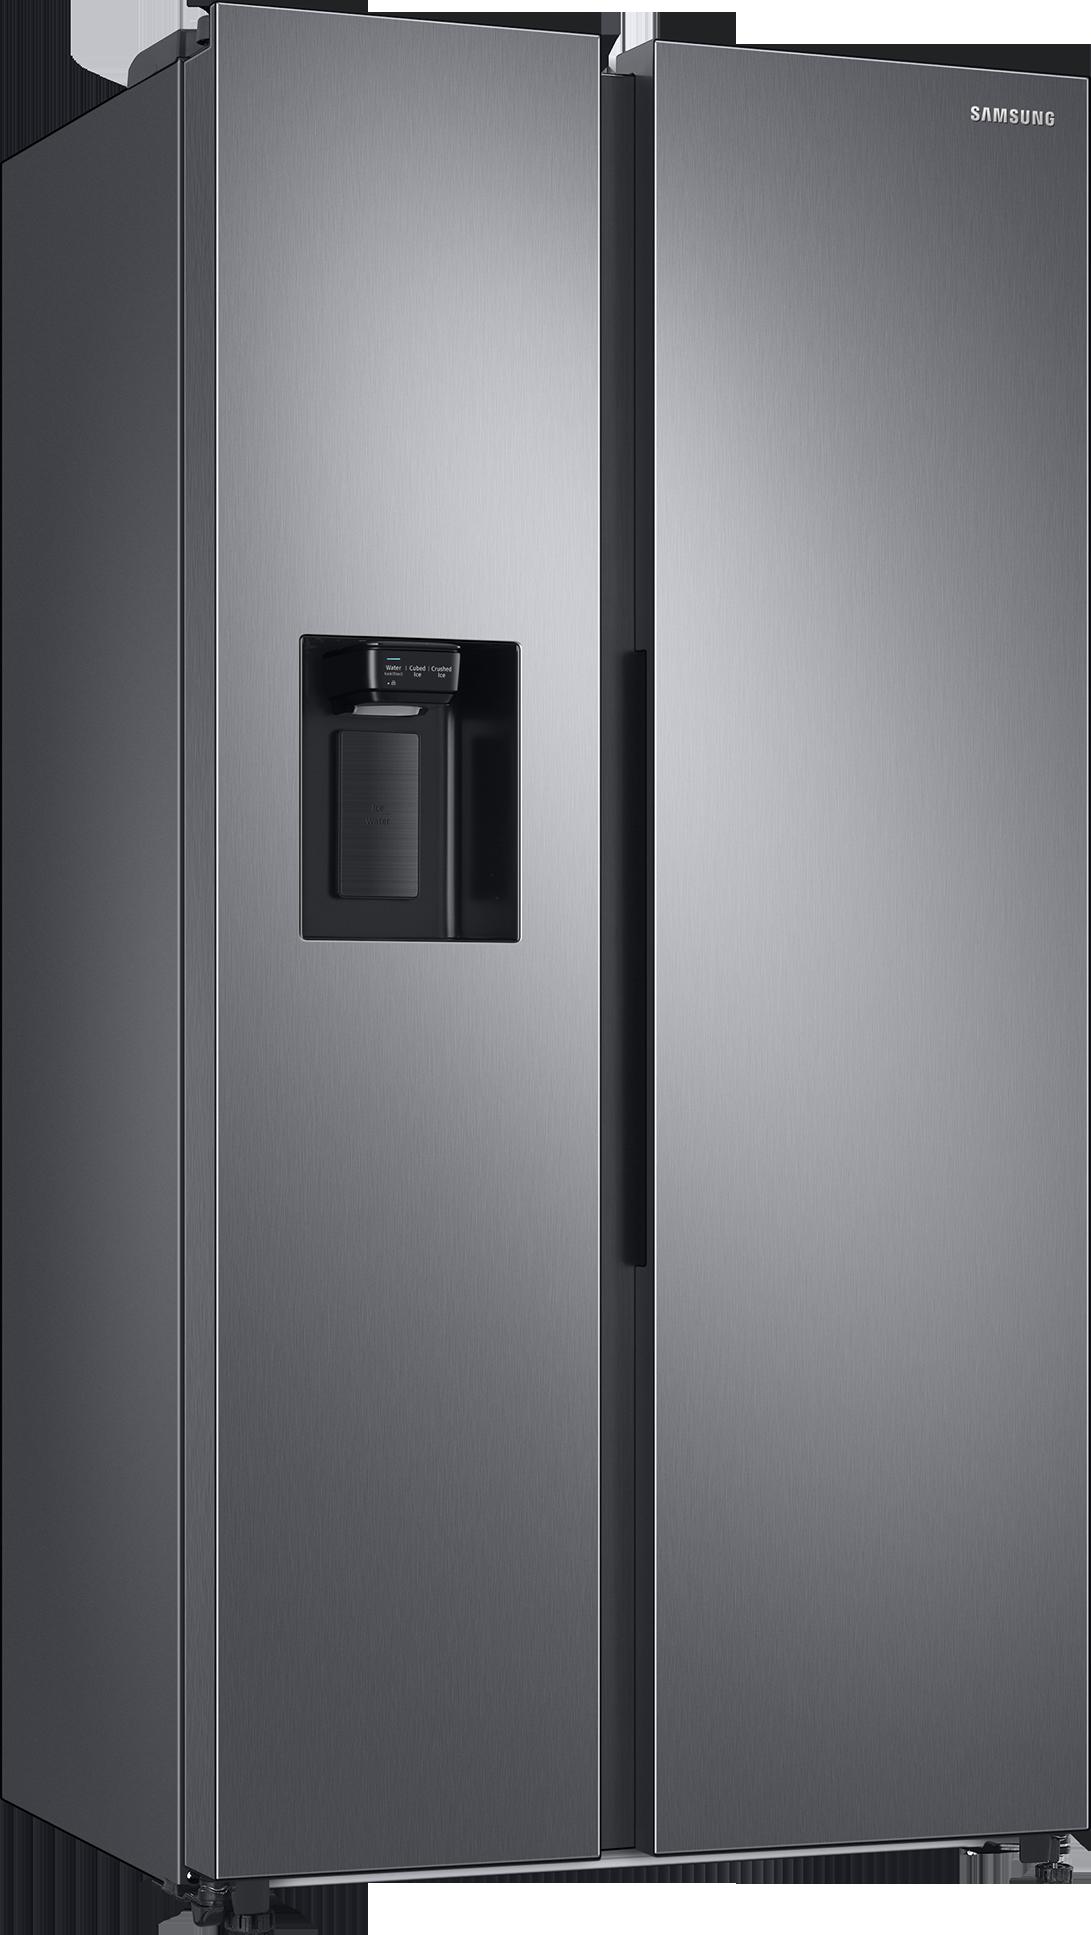 SAMSUNG RS68A8840S9